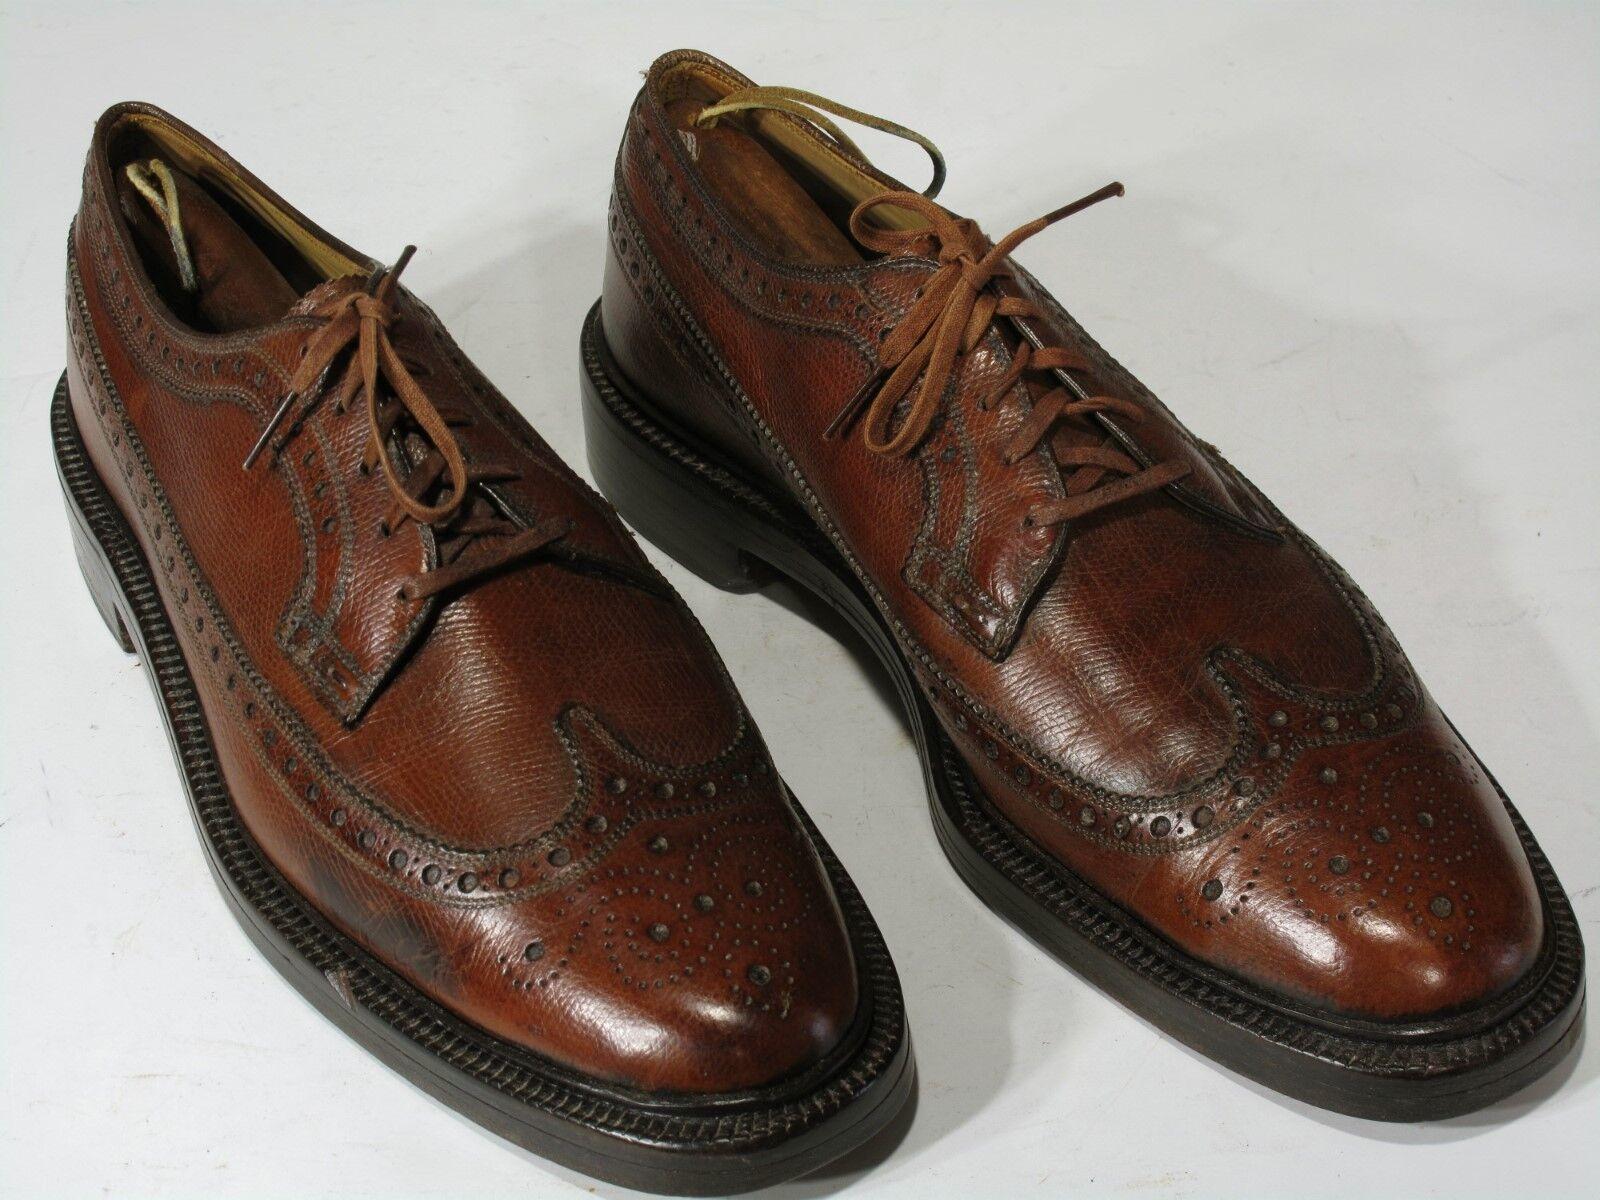 Vtg NETTLETON Wingtip Schuhes Leder 10 4A Extra Narrow, Whiskey Leder Schuhes Longwings. 94a12e